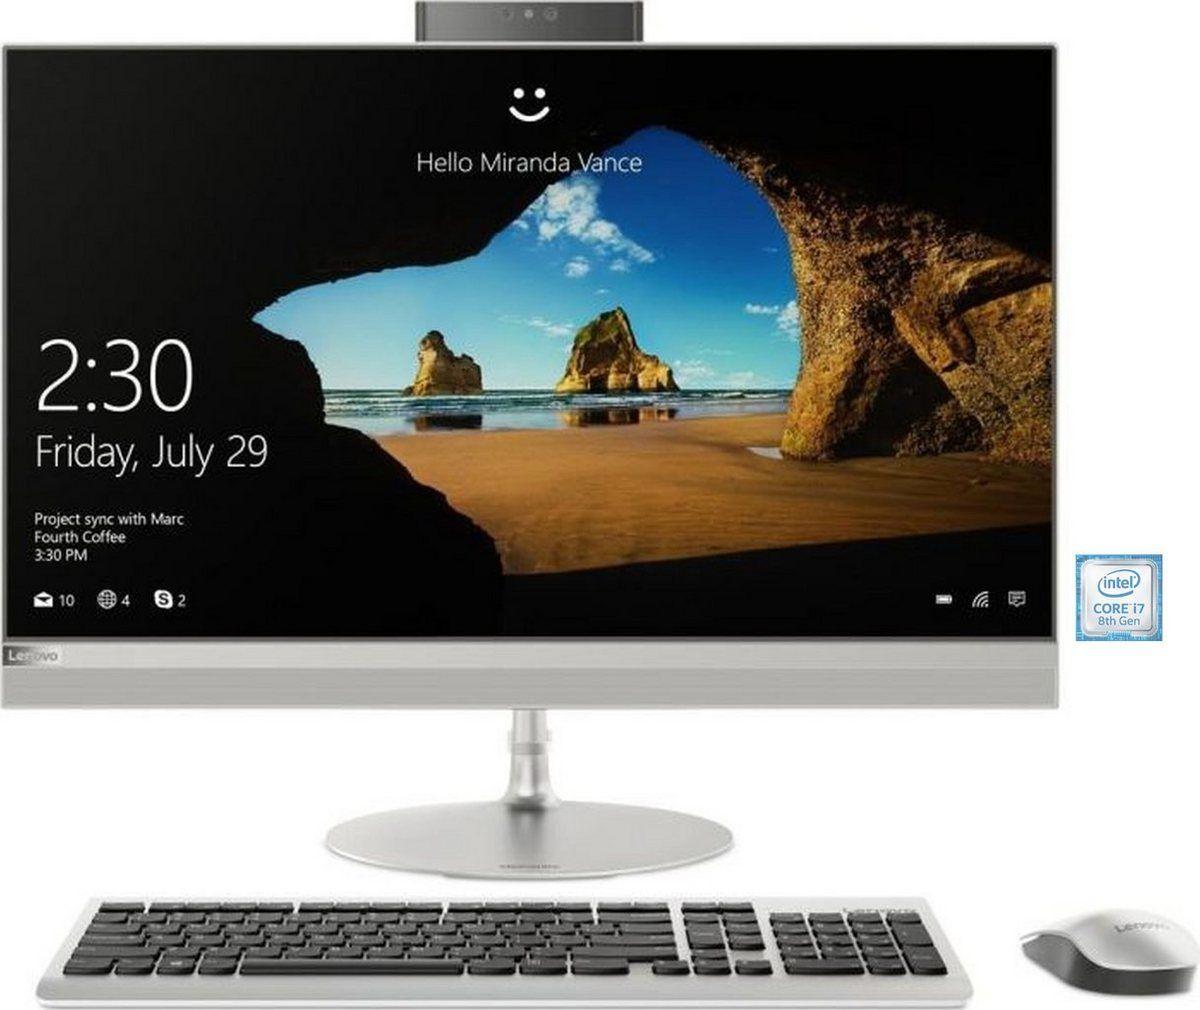 Lenovo Ideacentre 310s 08asr Refresh Desktop Amd A9 256 Gb 8 Gb Online Kaufen Desktop Arbeitsspeicher Mikrofon